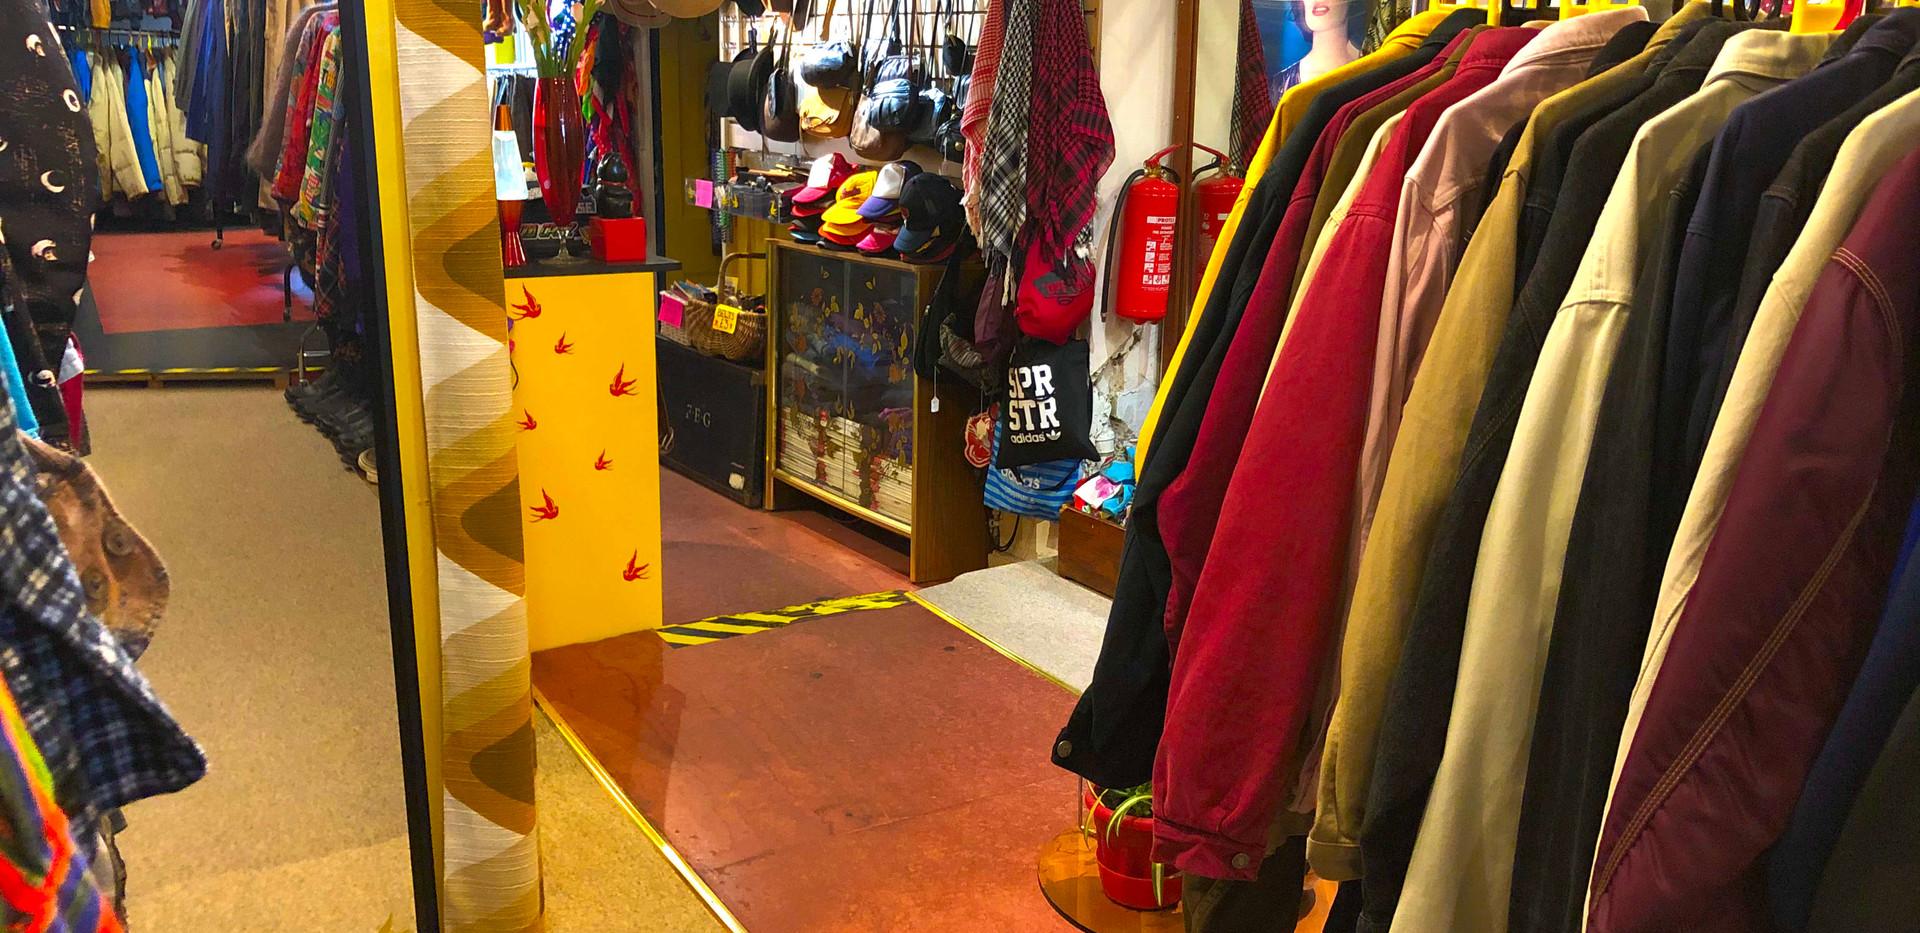 The Yellow Shop 3451.jpg